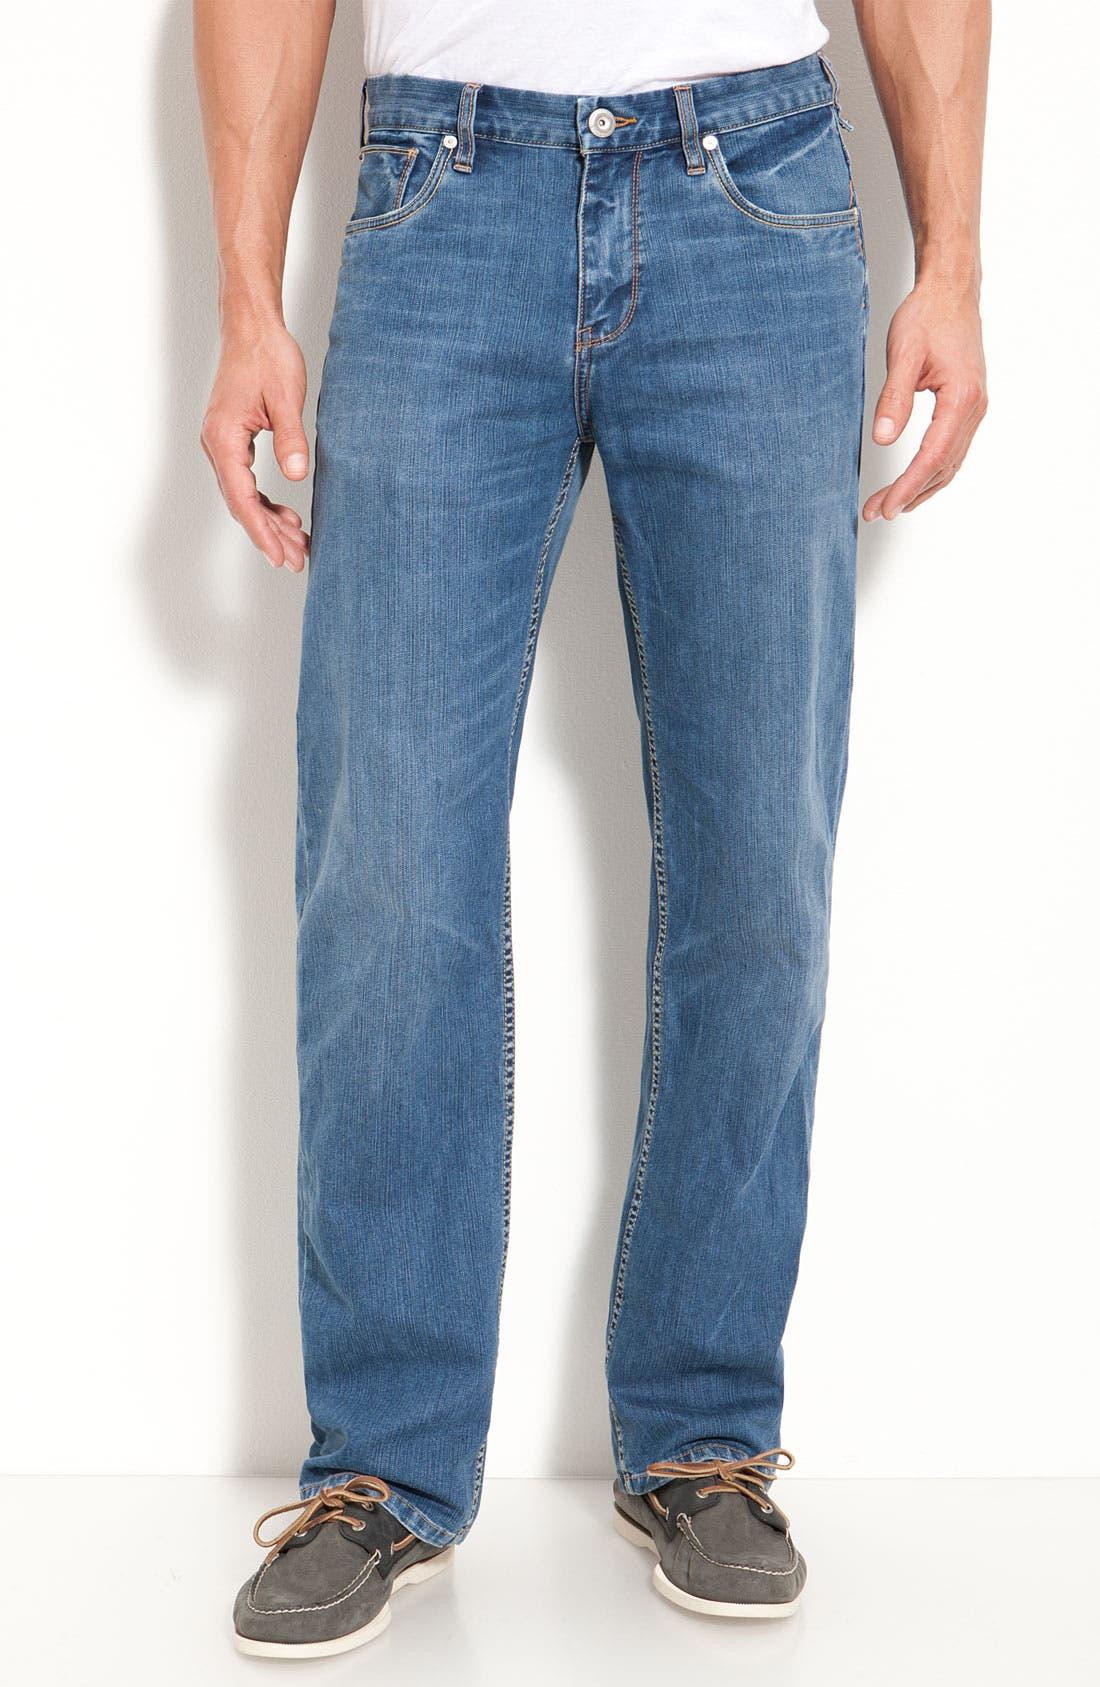 Alternate Image 1 Selected - Tommy Bahama Denim 'Calo' Standard Jeans (Medium Worn)(Big & Tall)